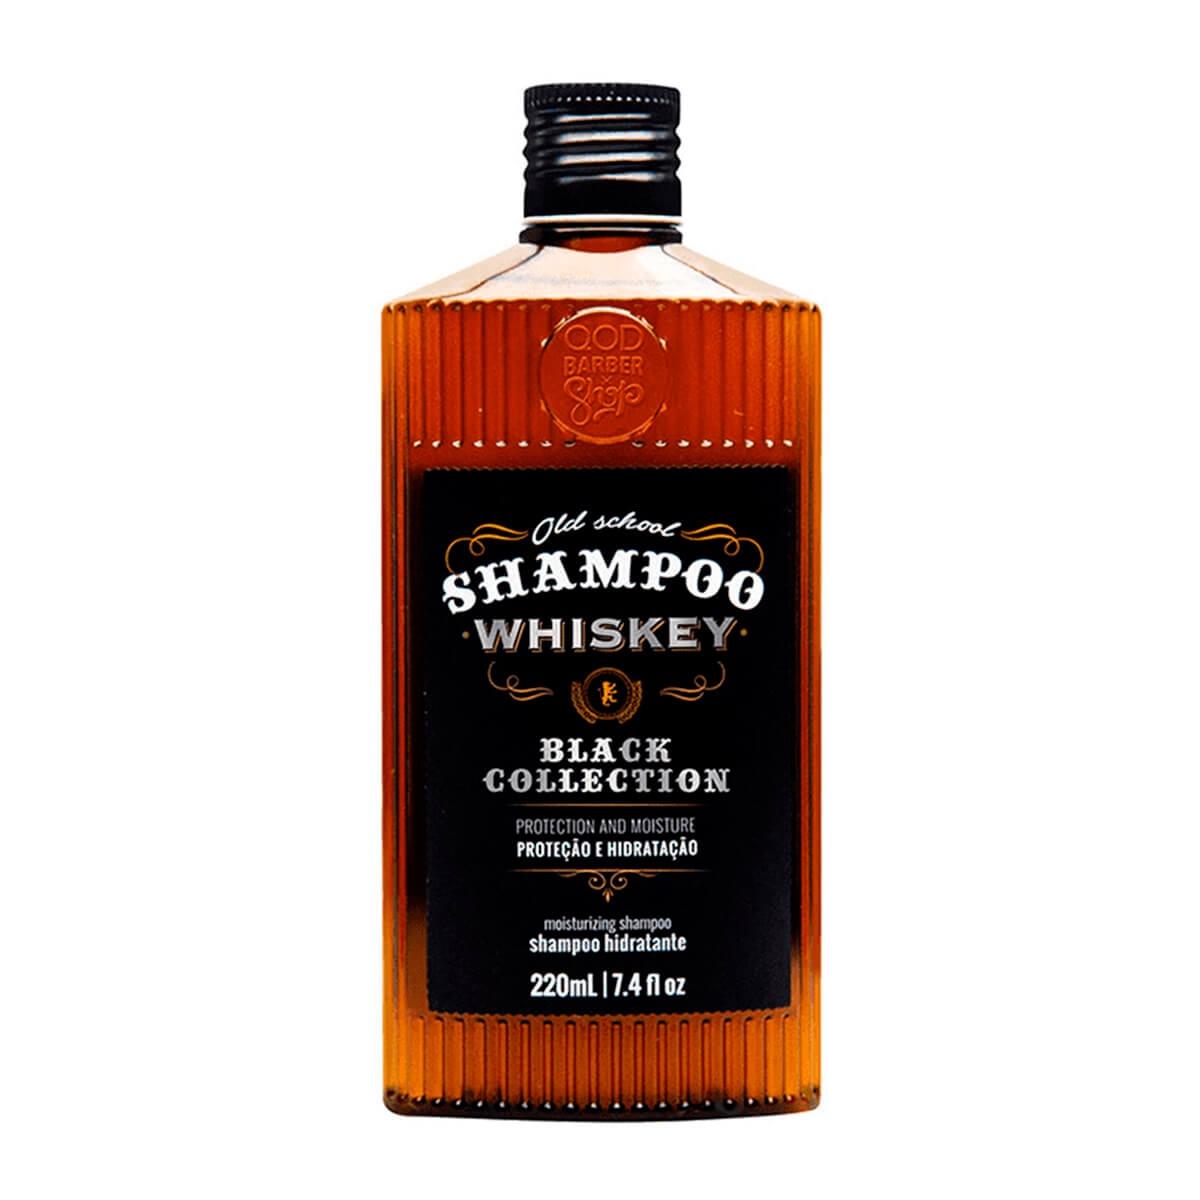 Shampoo QBS Whiskey Black Collection QOD 220ml